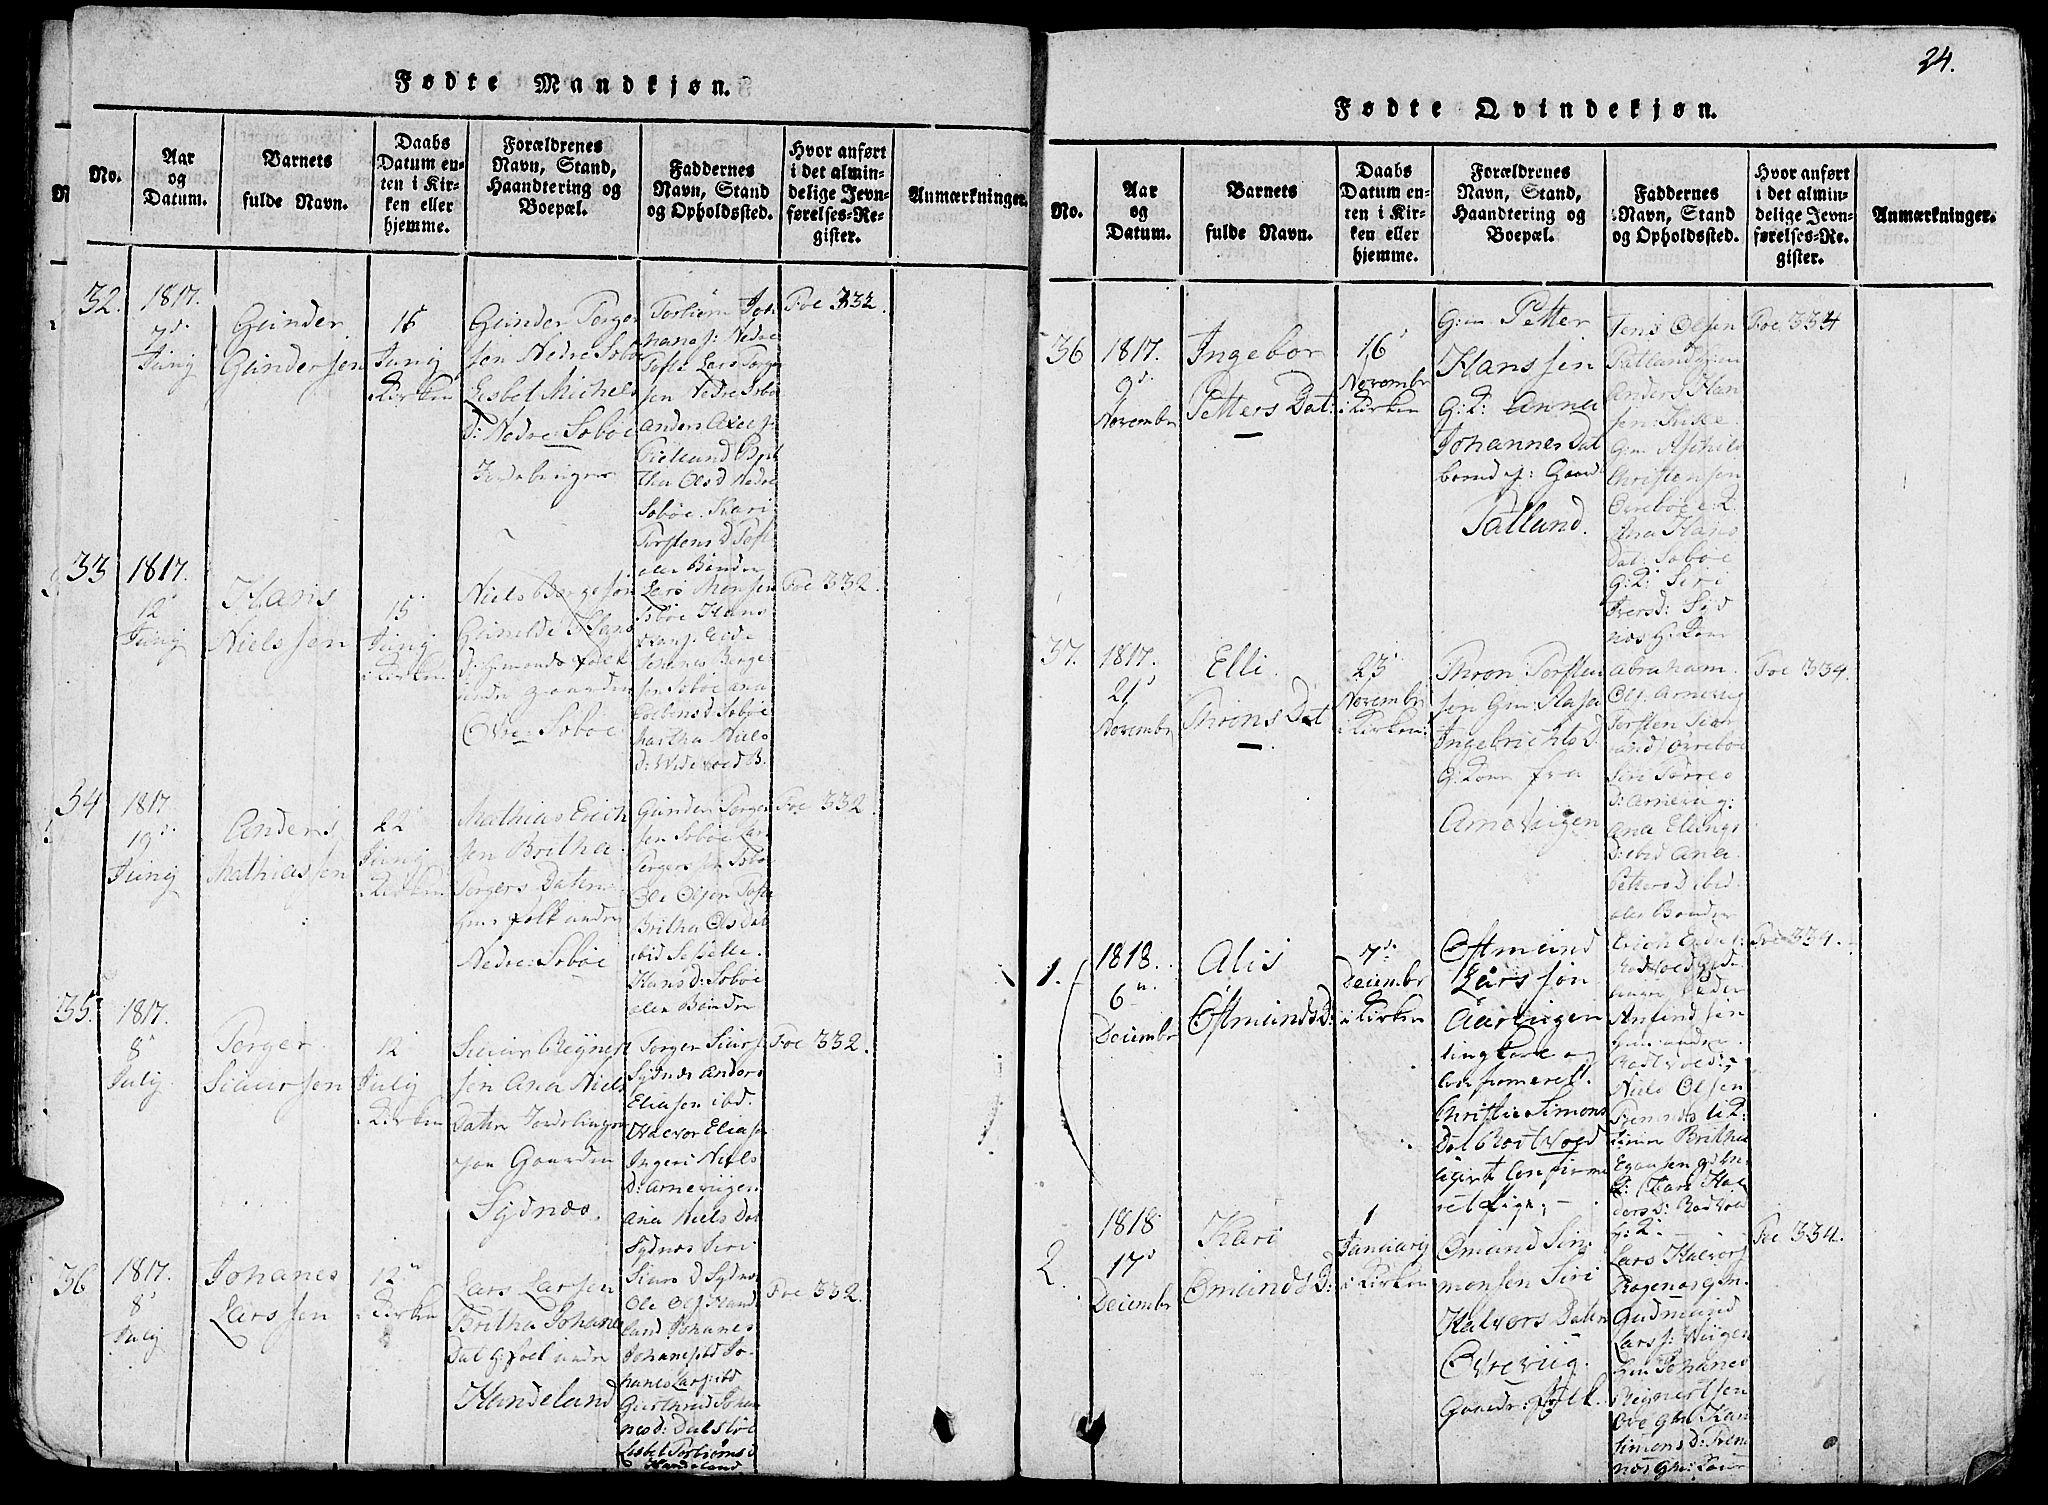 SAB, Fjelberg sokneprestembete, H/Haa: Ministerialbok nr. A 4, 1816-1822, s. 24